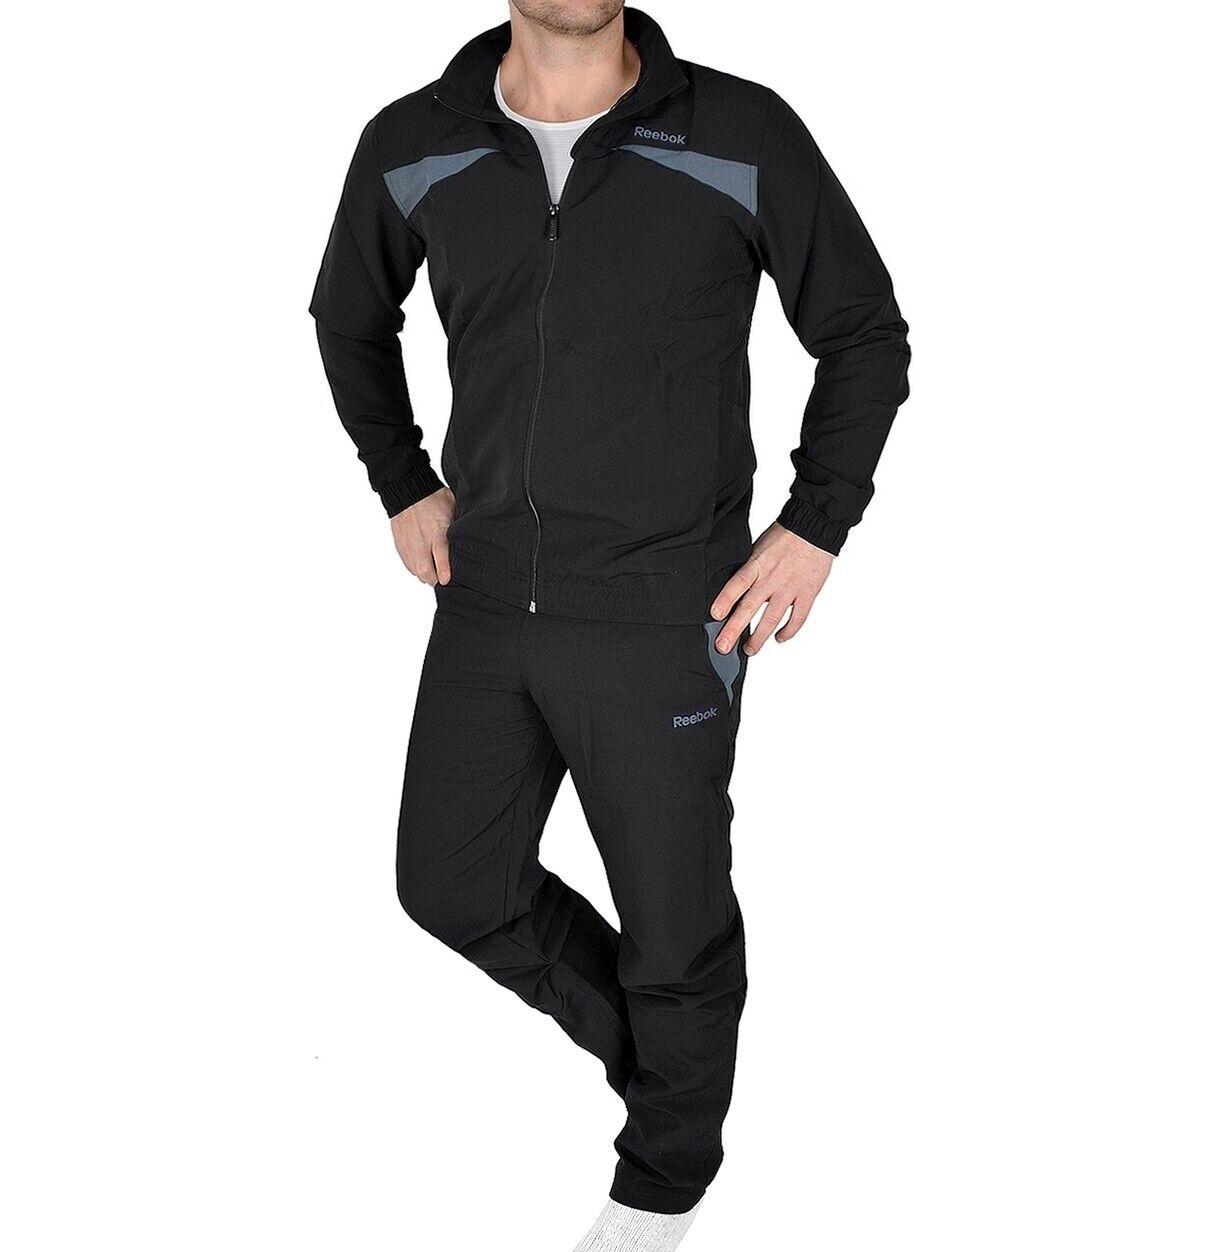 Reebok Herren Trainingsanzug Jogginganzug Fitness Sport Anzug Jacke+Hose schwarz